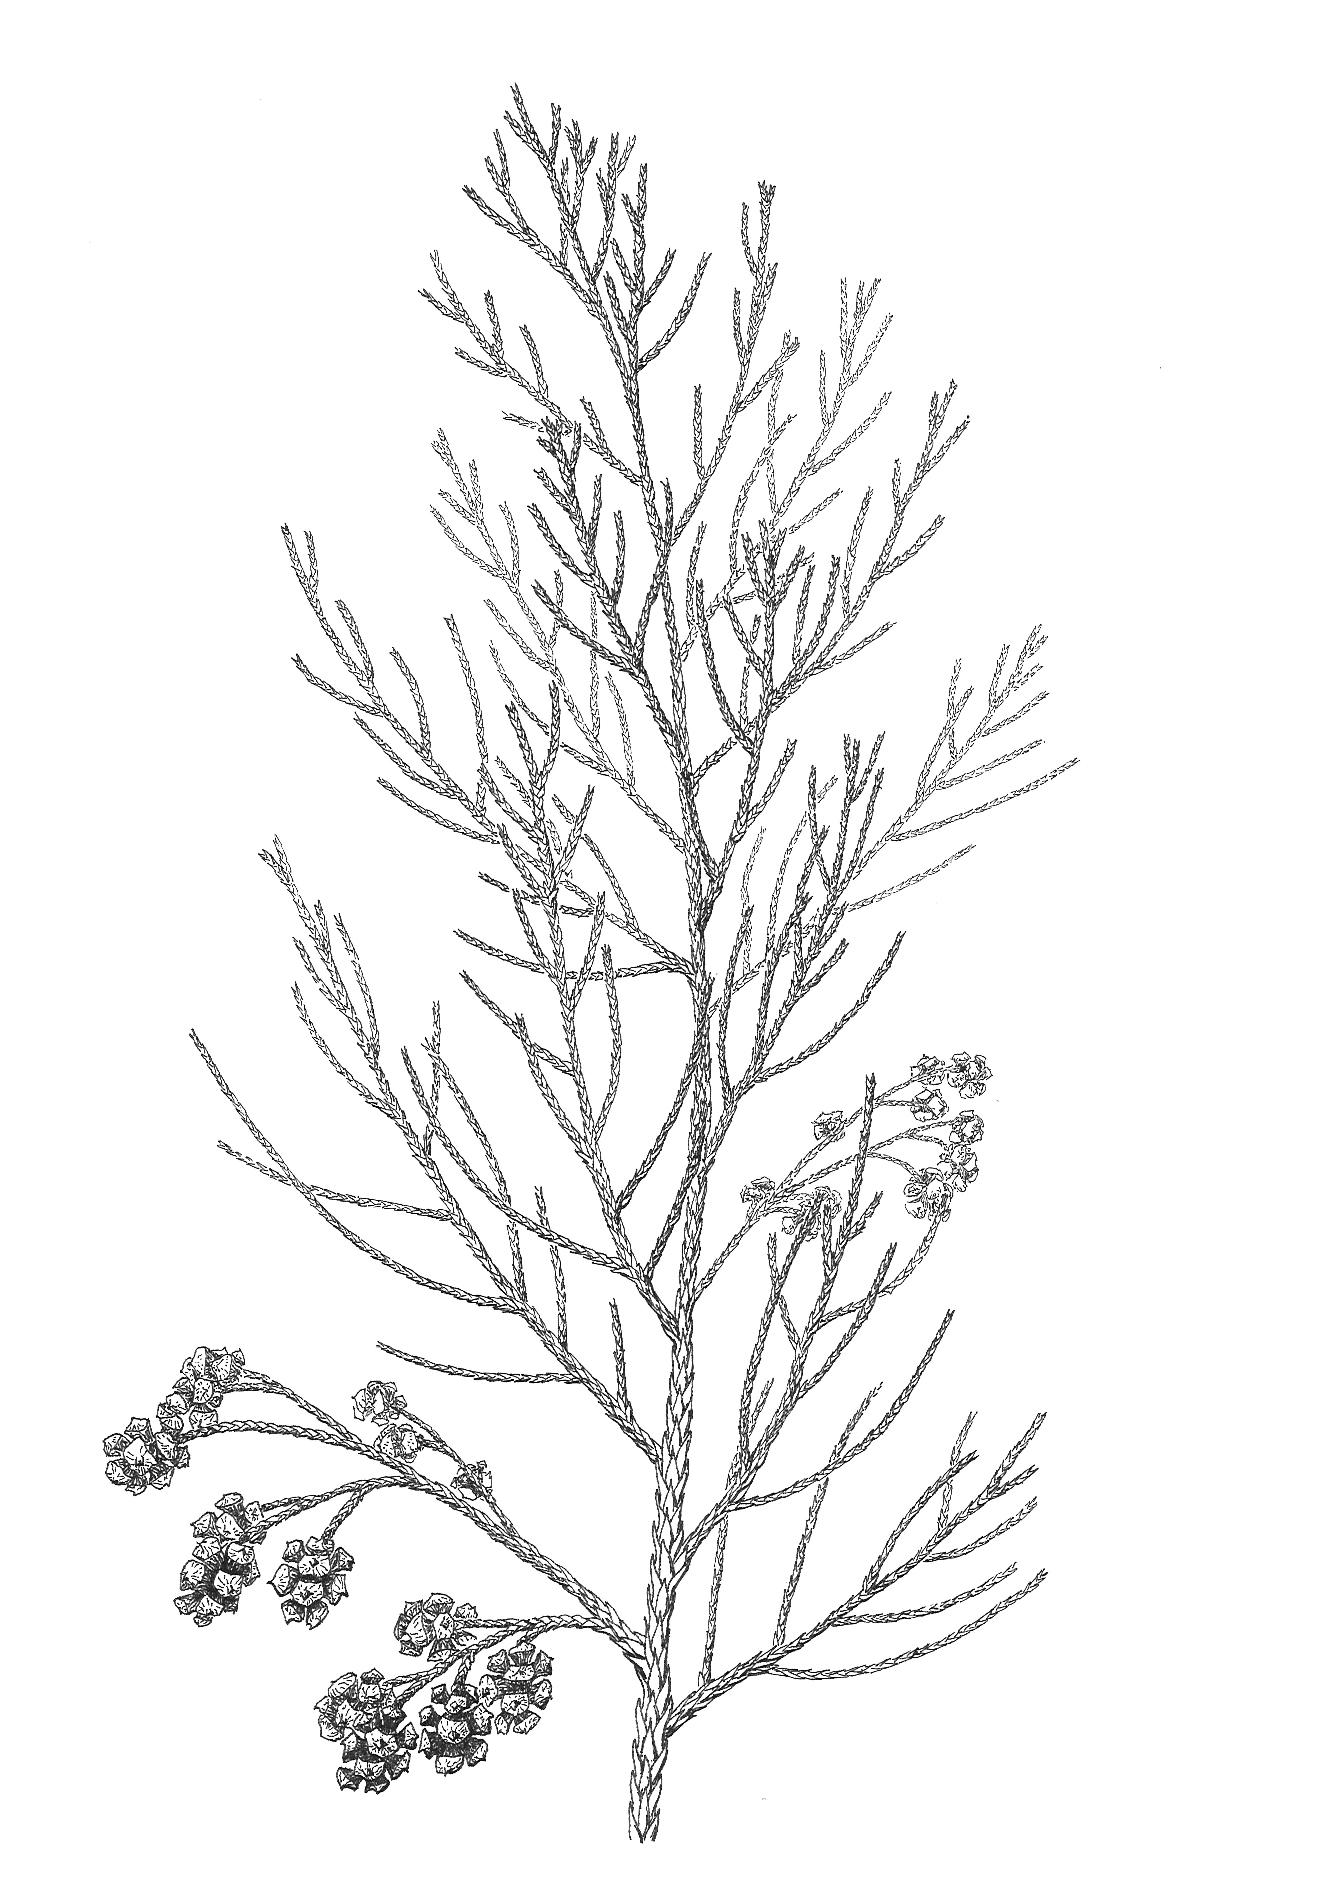 Sphenolepsis